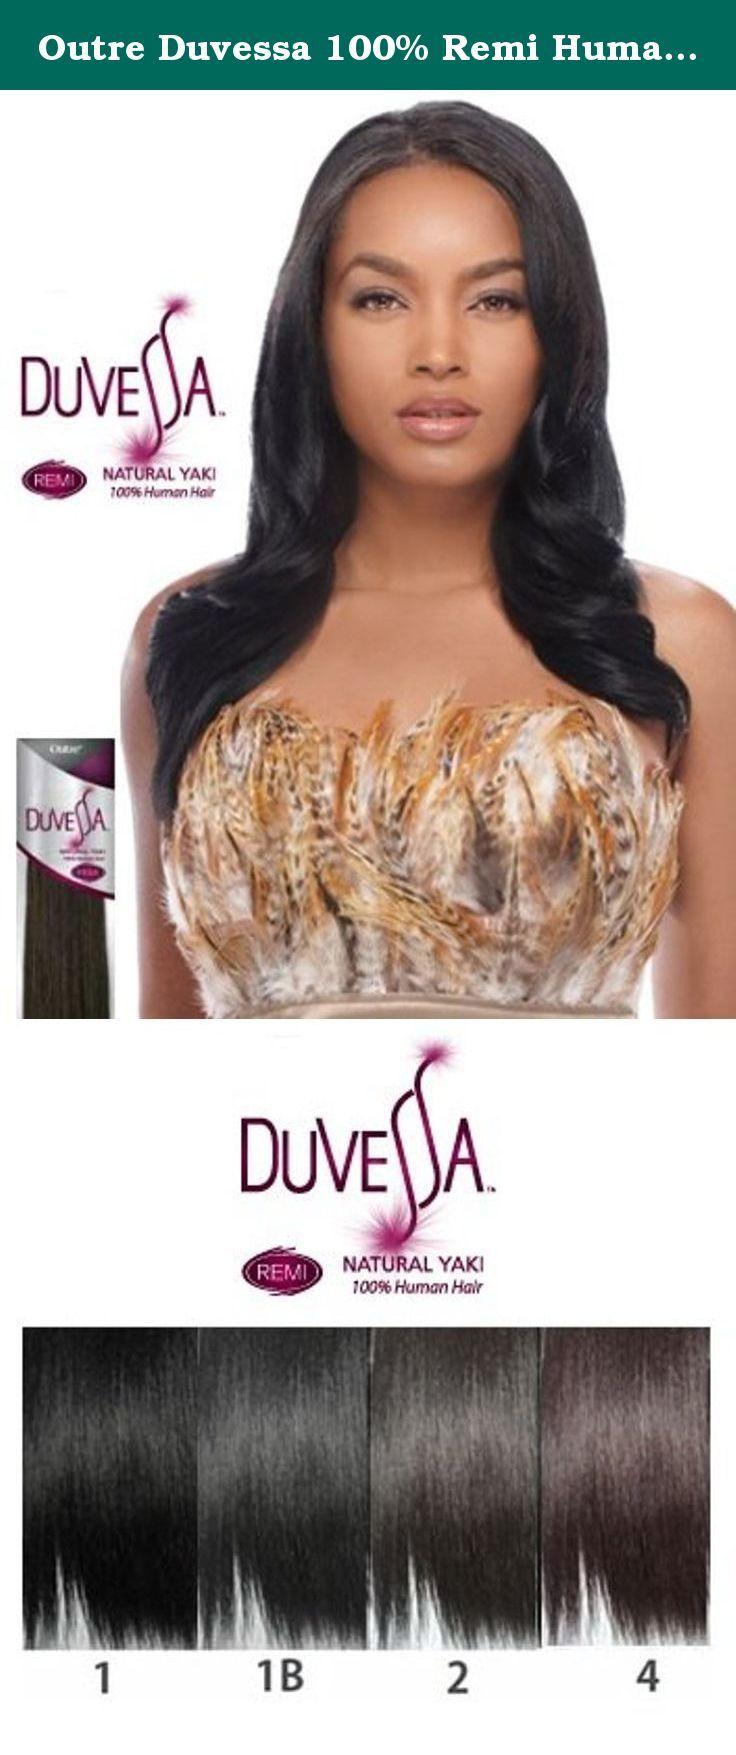 Outre Duvessa 100 Remi Human Hair Weave Natural Yaki 14 Inch 4